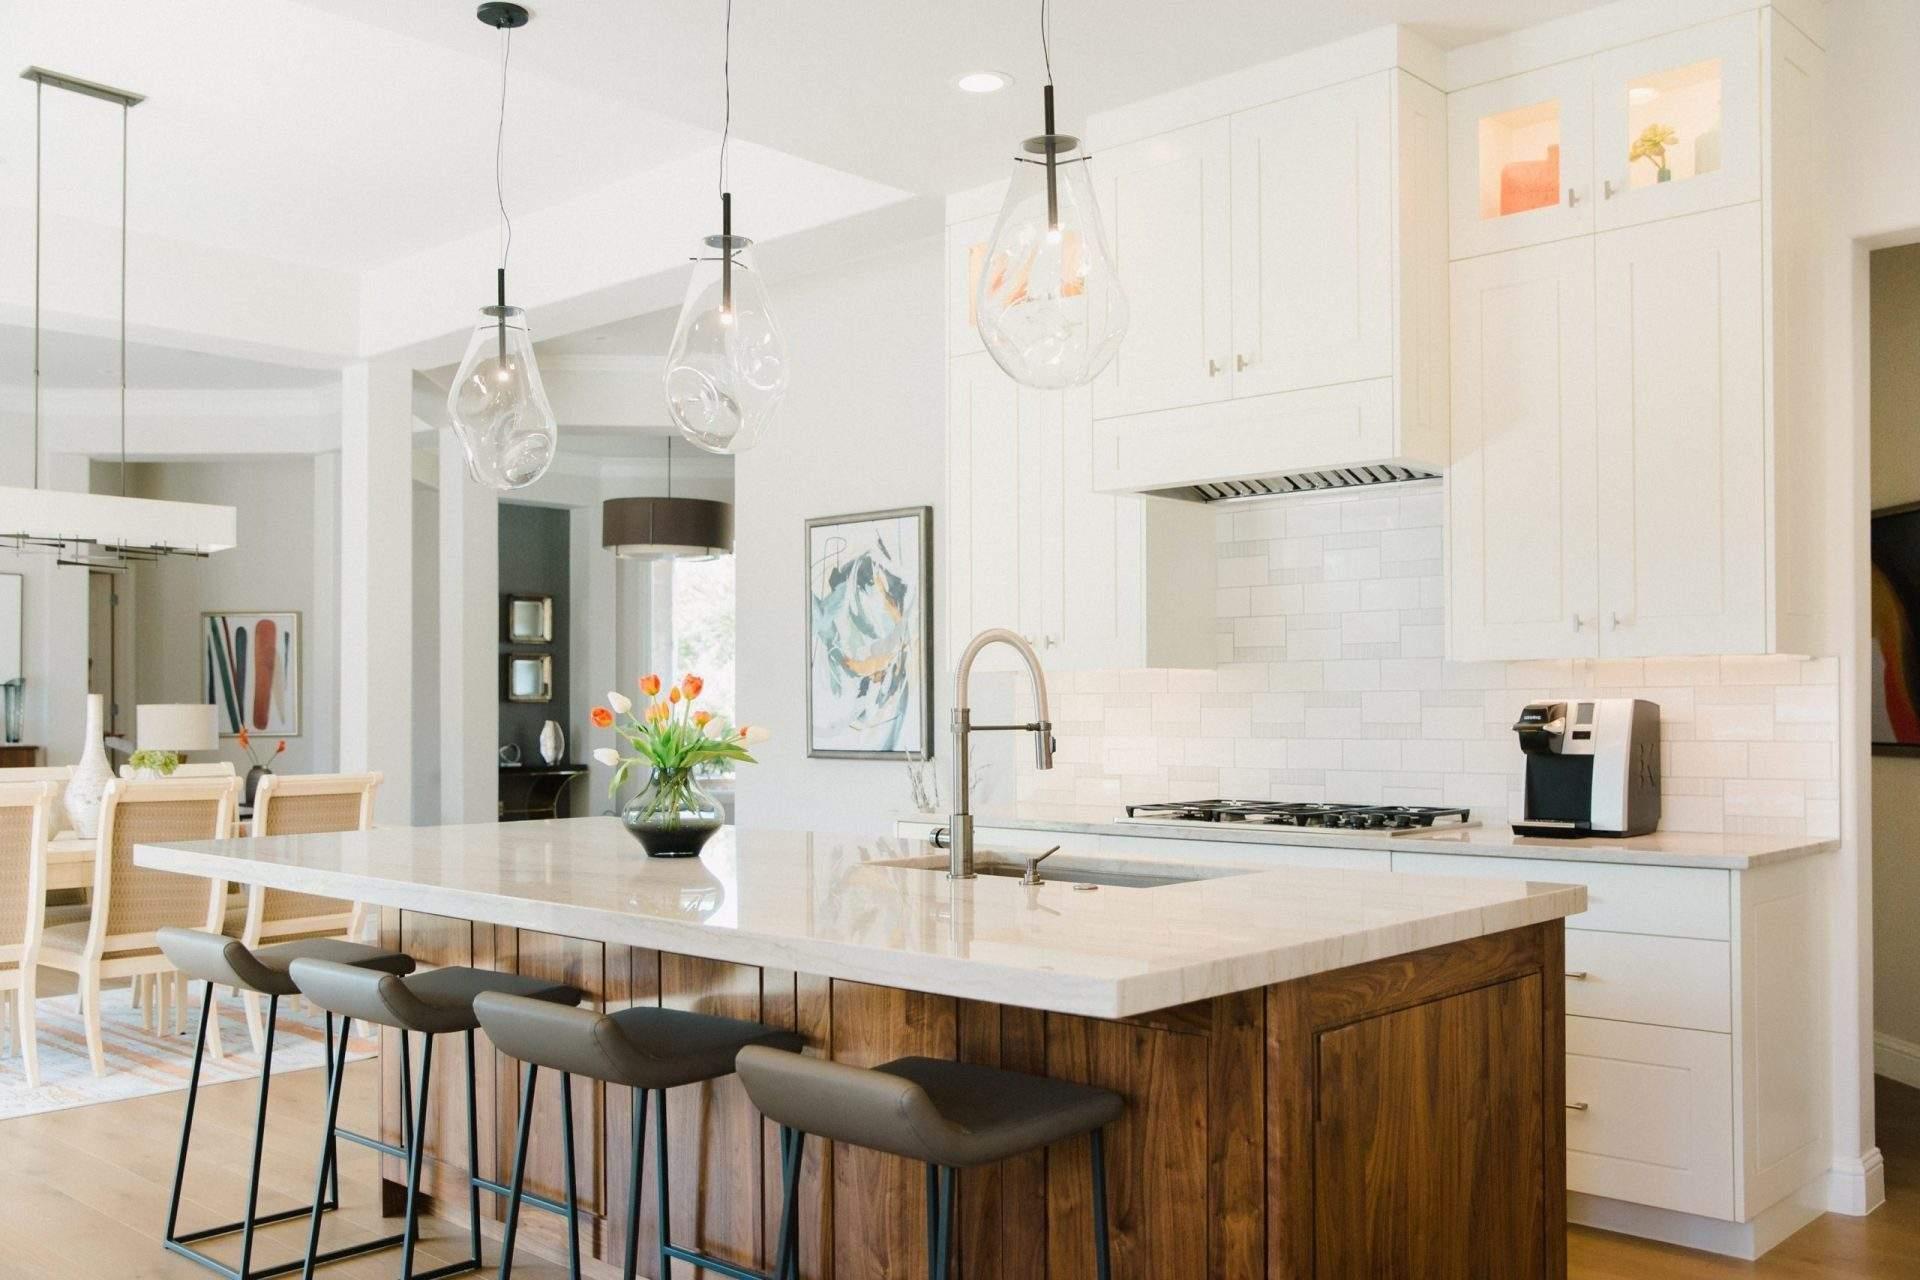 Interior Design, Sit At Island Bar, Etch Interior Design, Austin, Texas